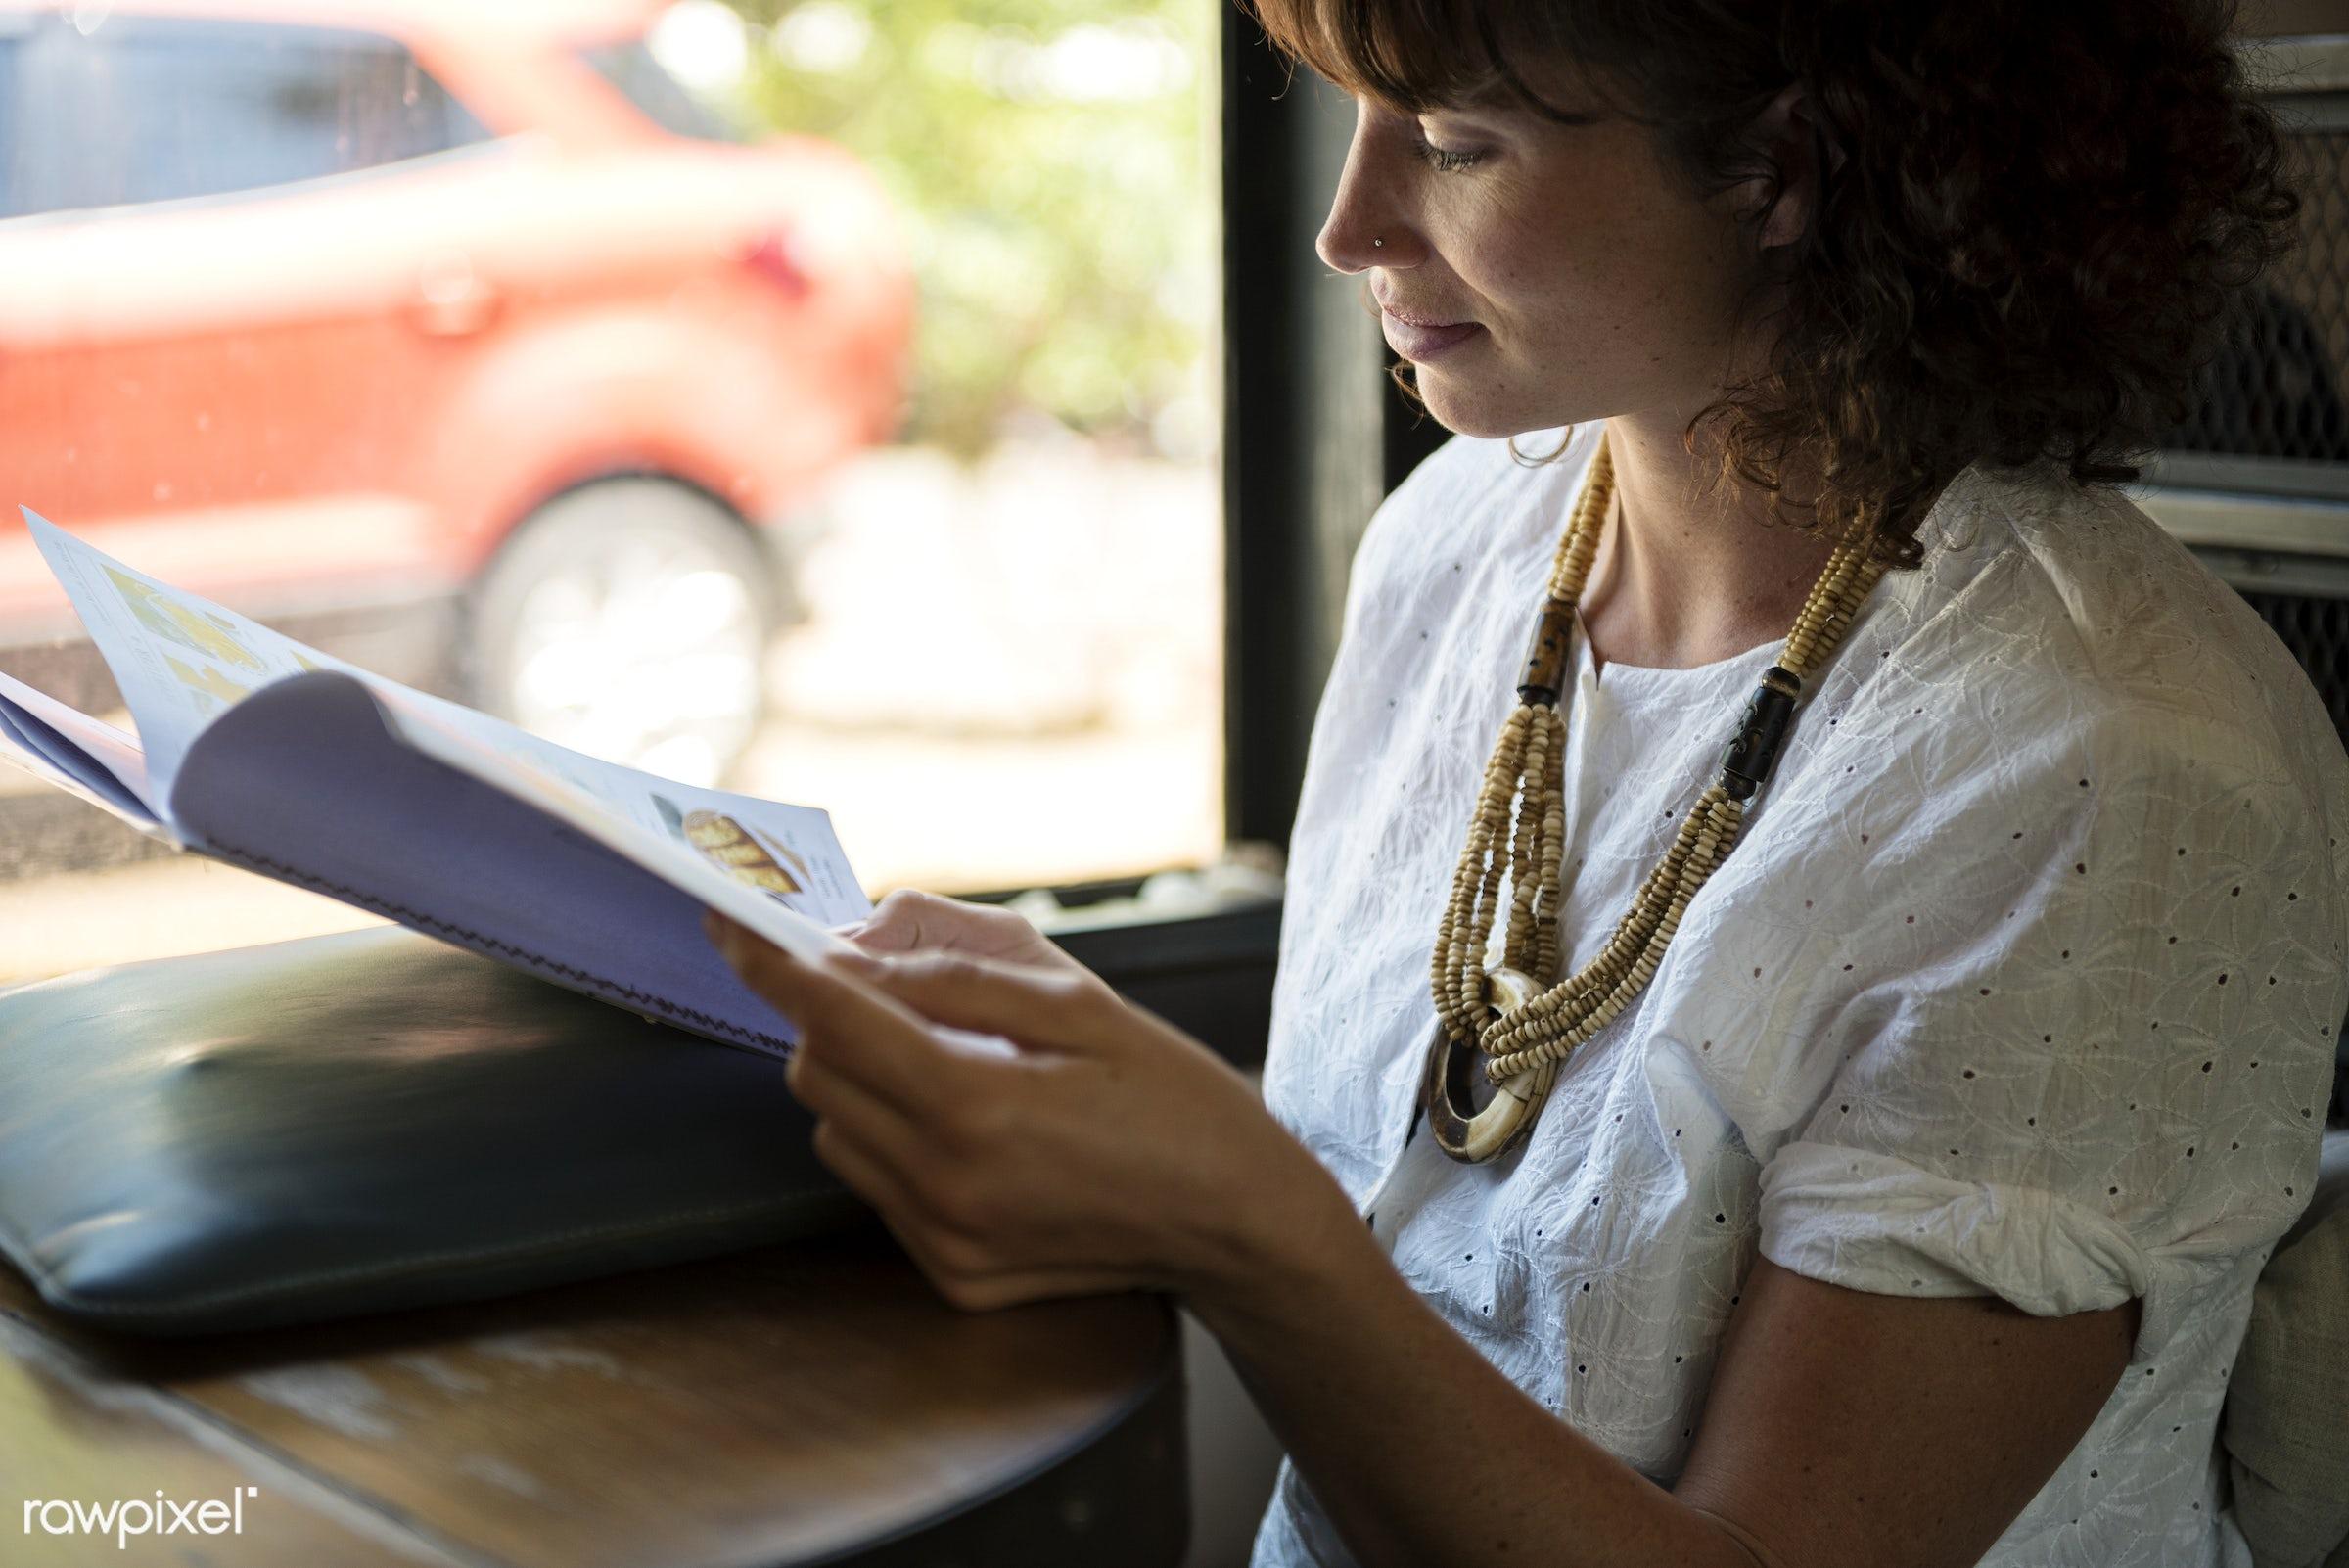 magazine, book, woman, break, cafe, cc0, coffee shop, creative common 0, creative commons 0, hangout, leisure, note,...